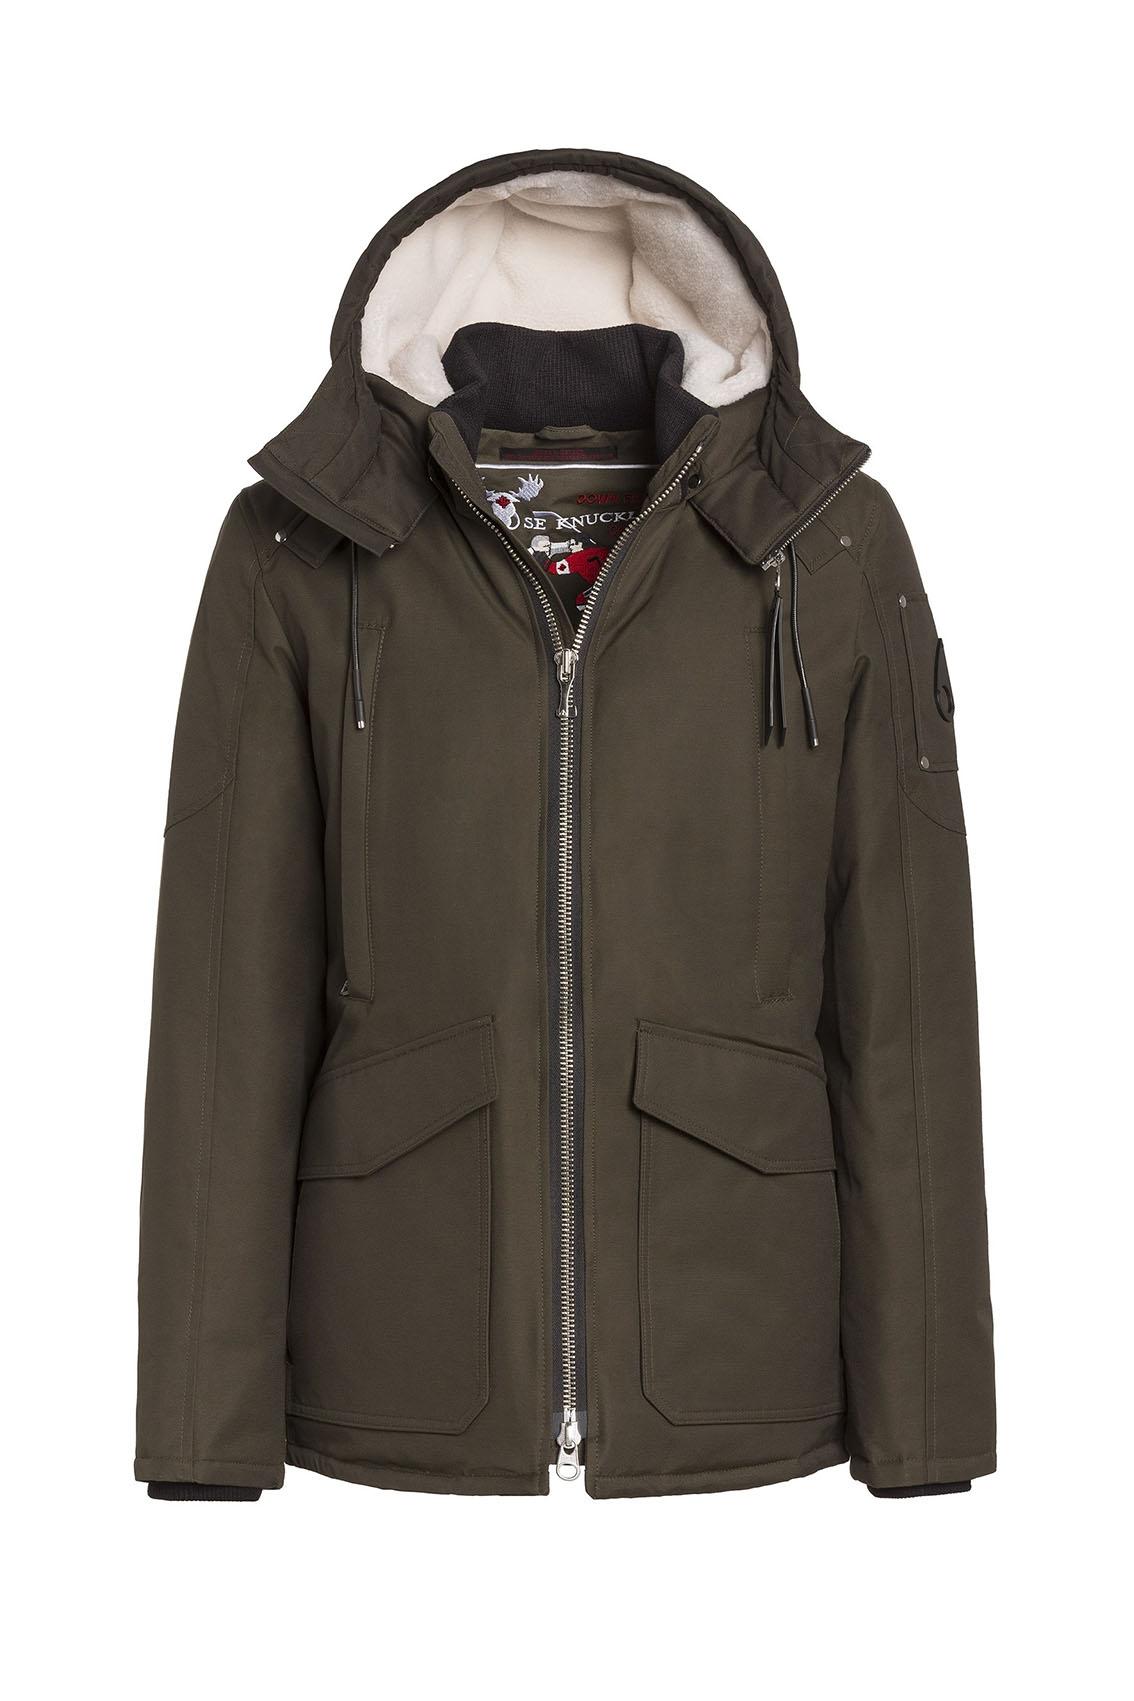 moose-knuckles_millstream-jacket10